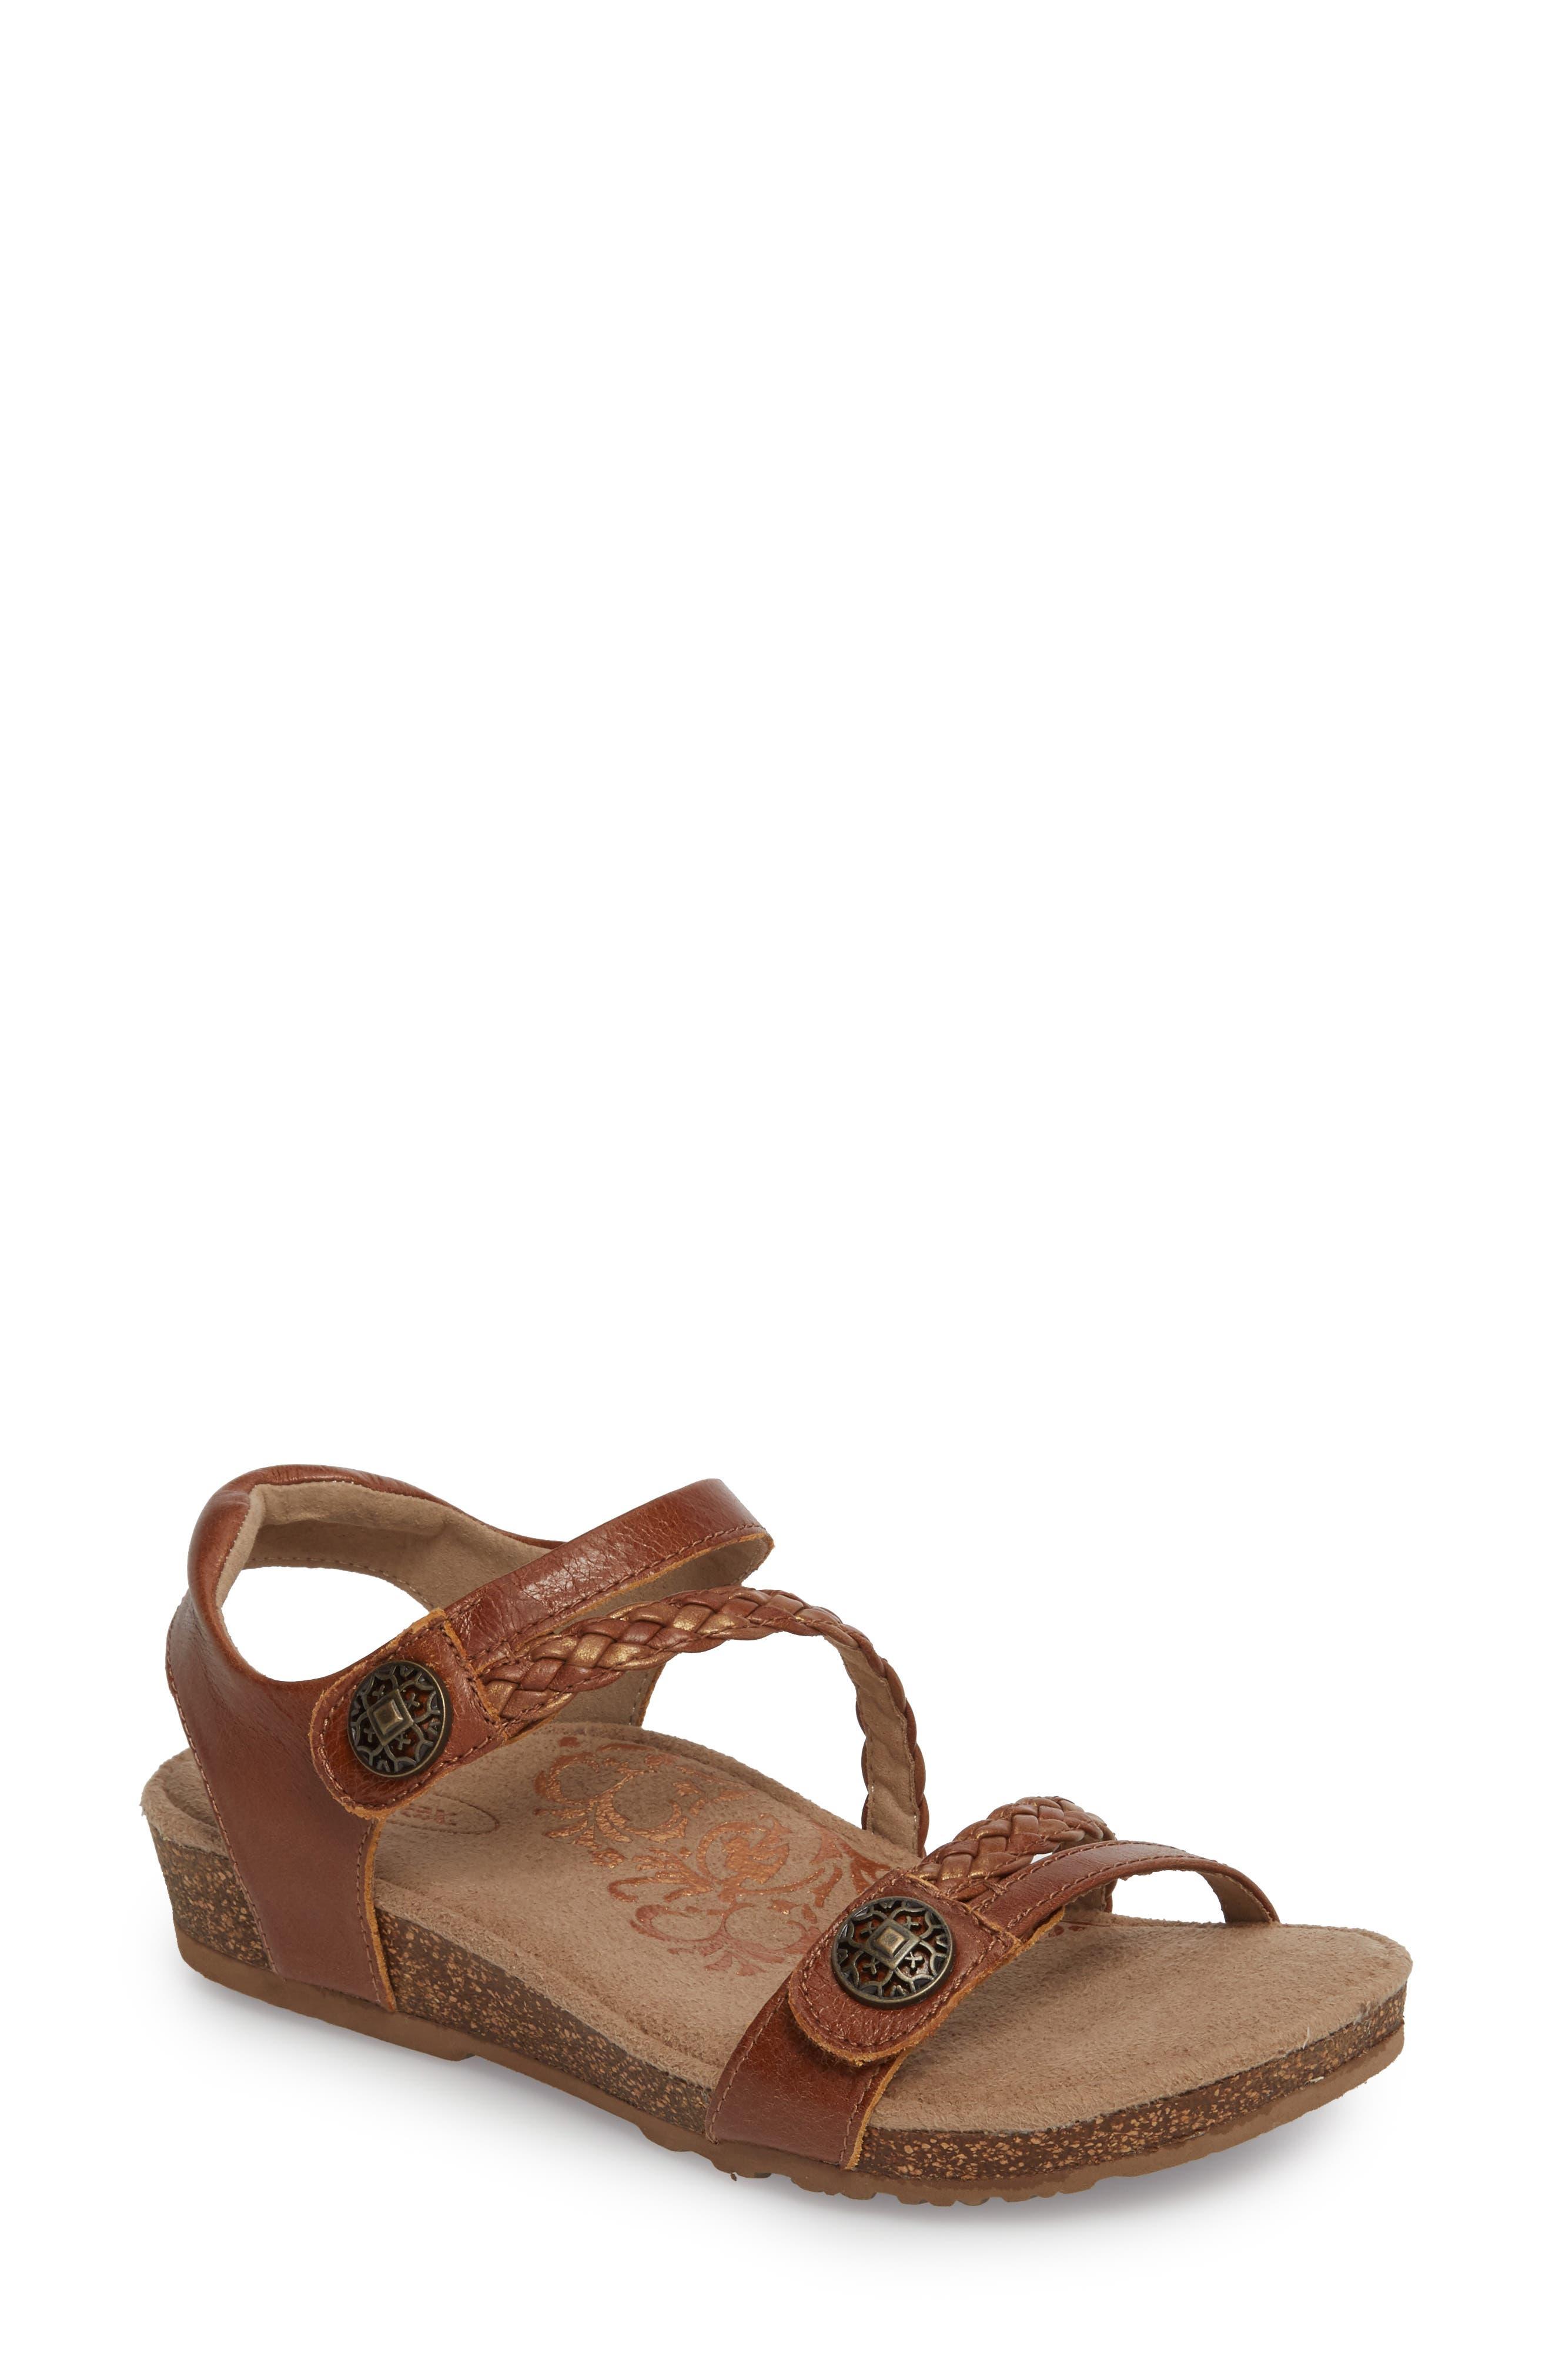 f6fac462dd8a Aetrex Sandals - Women s